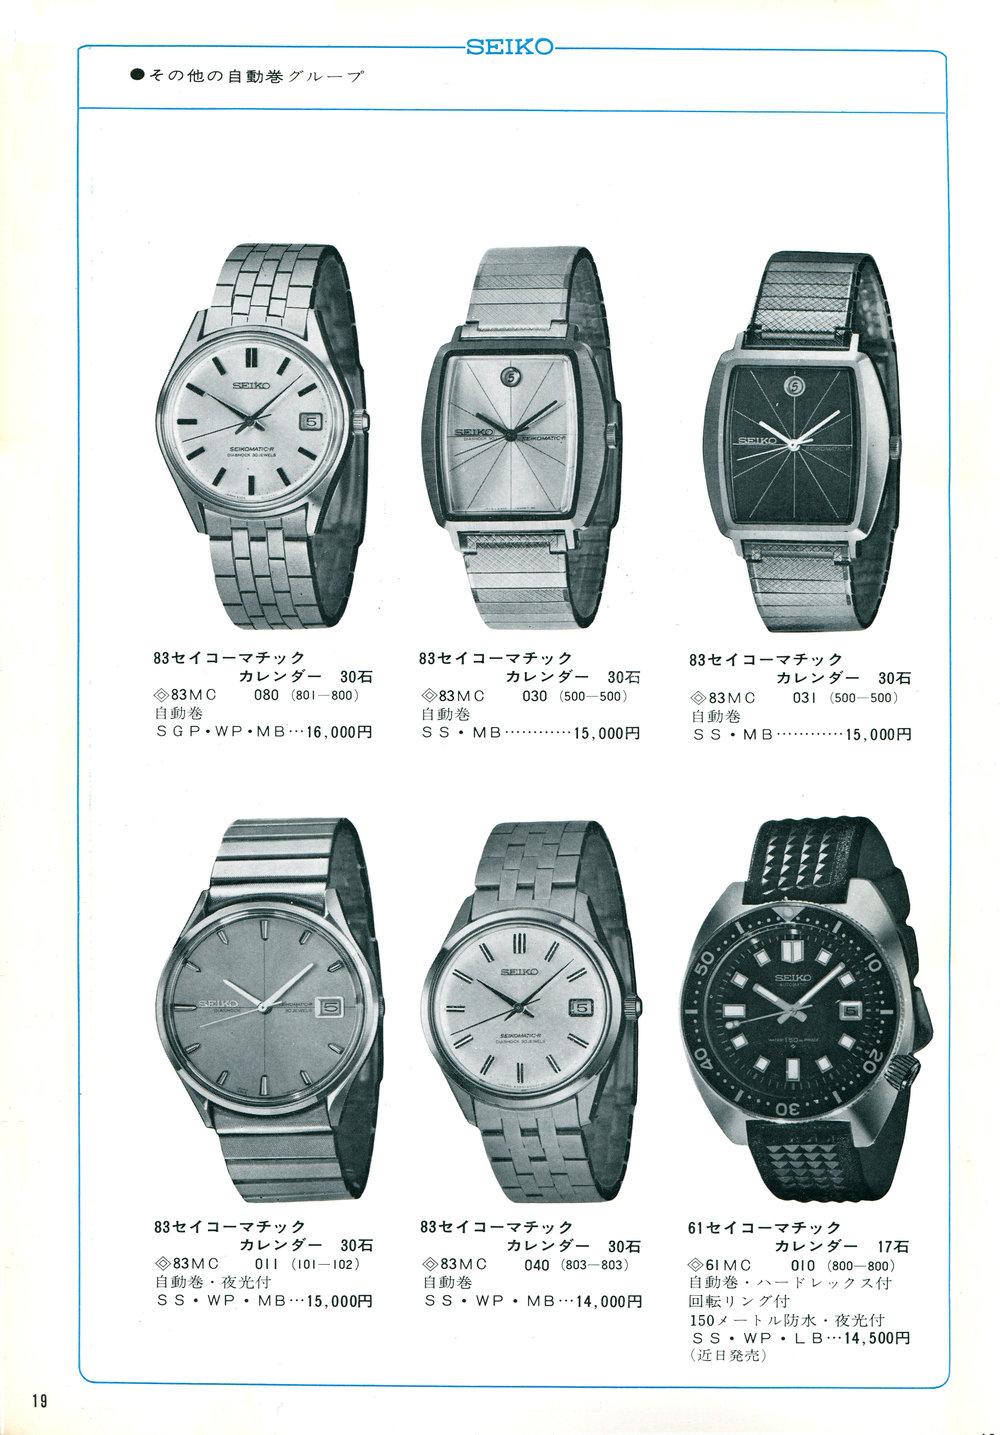 1968 Vol.2 Seiko JDM Catalog